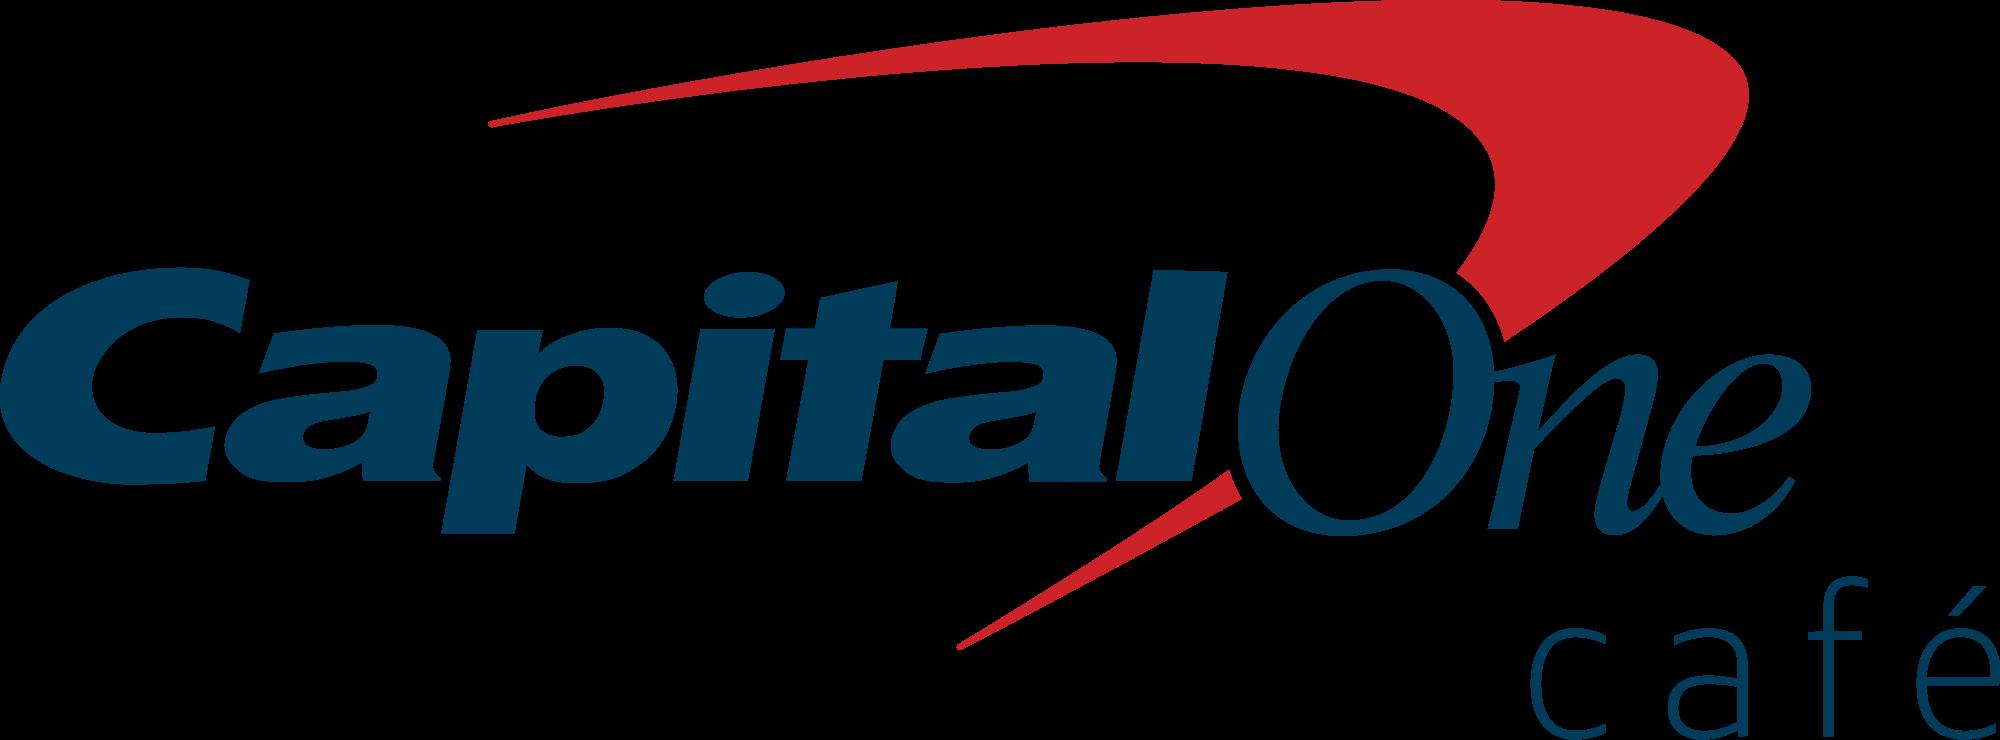 Web C1 Cafe Logo Opt Regular Ng Cmyk